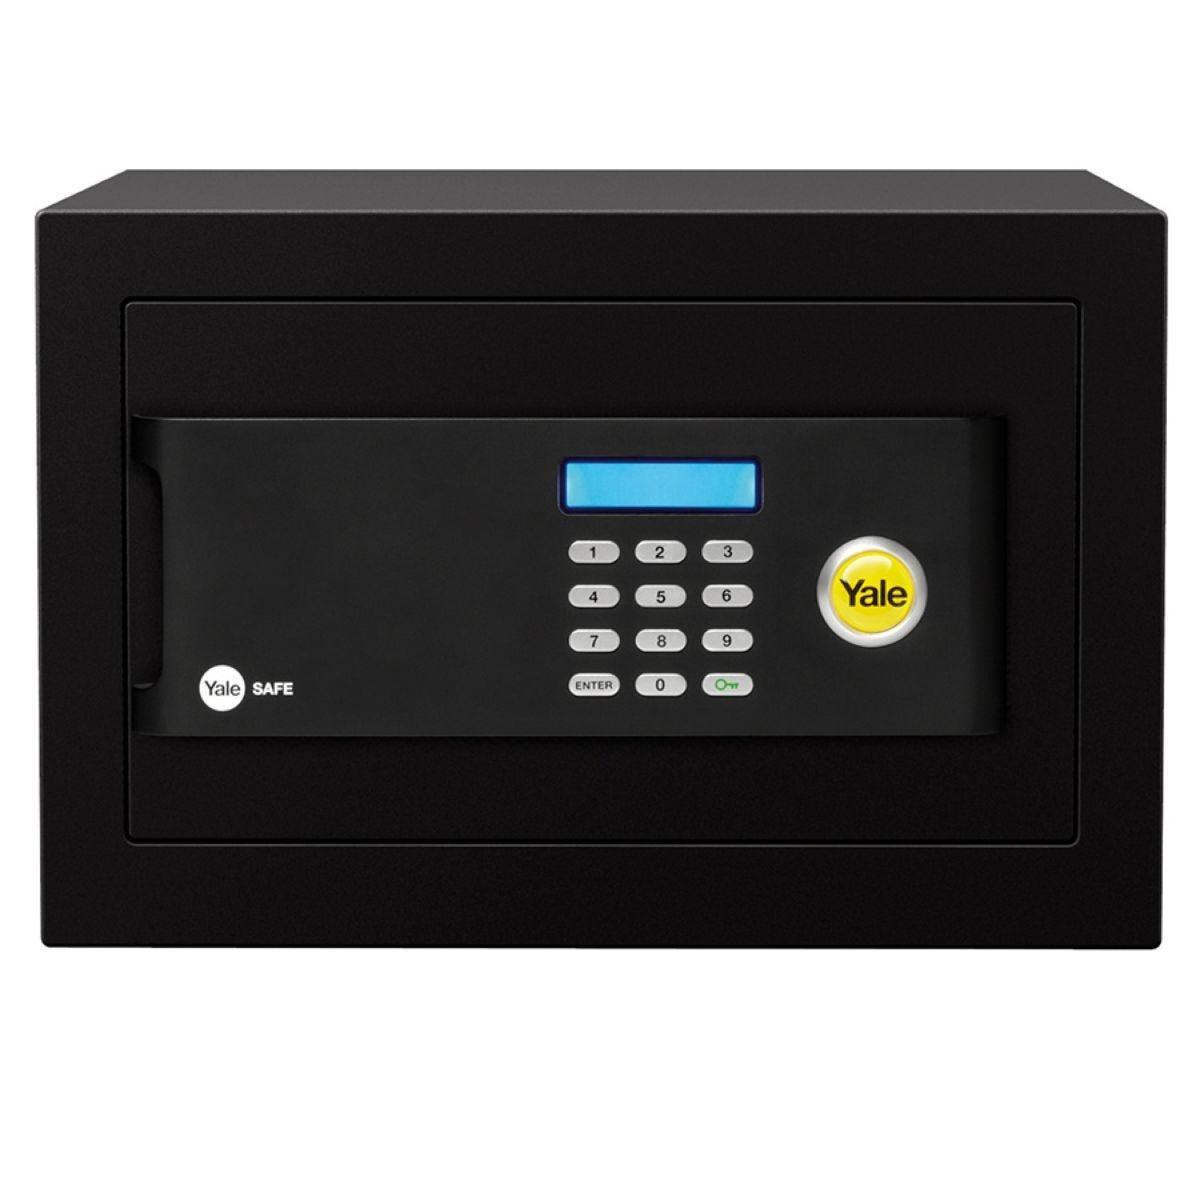 Yale Premium Electronic Digital Compact Safe